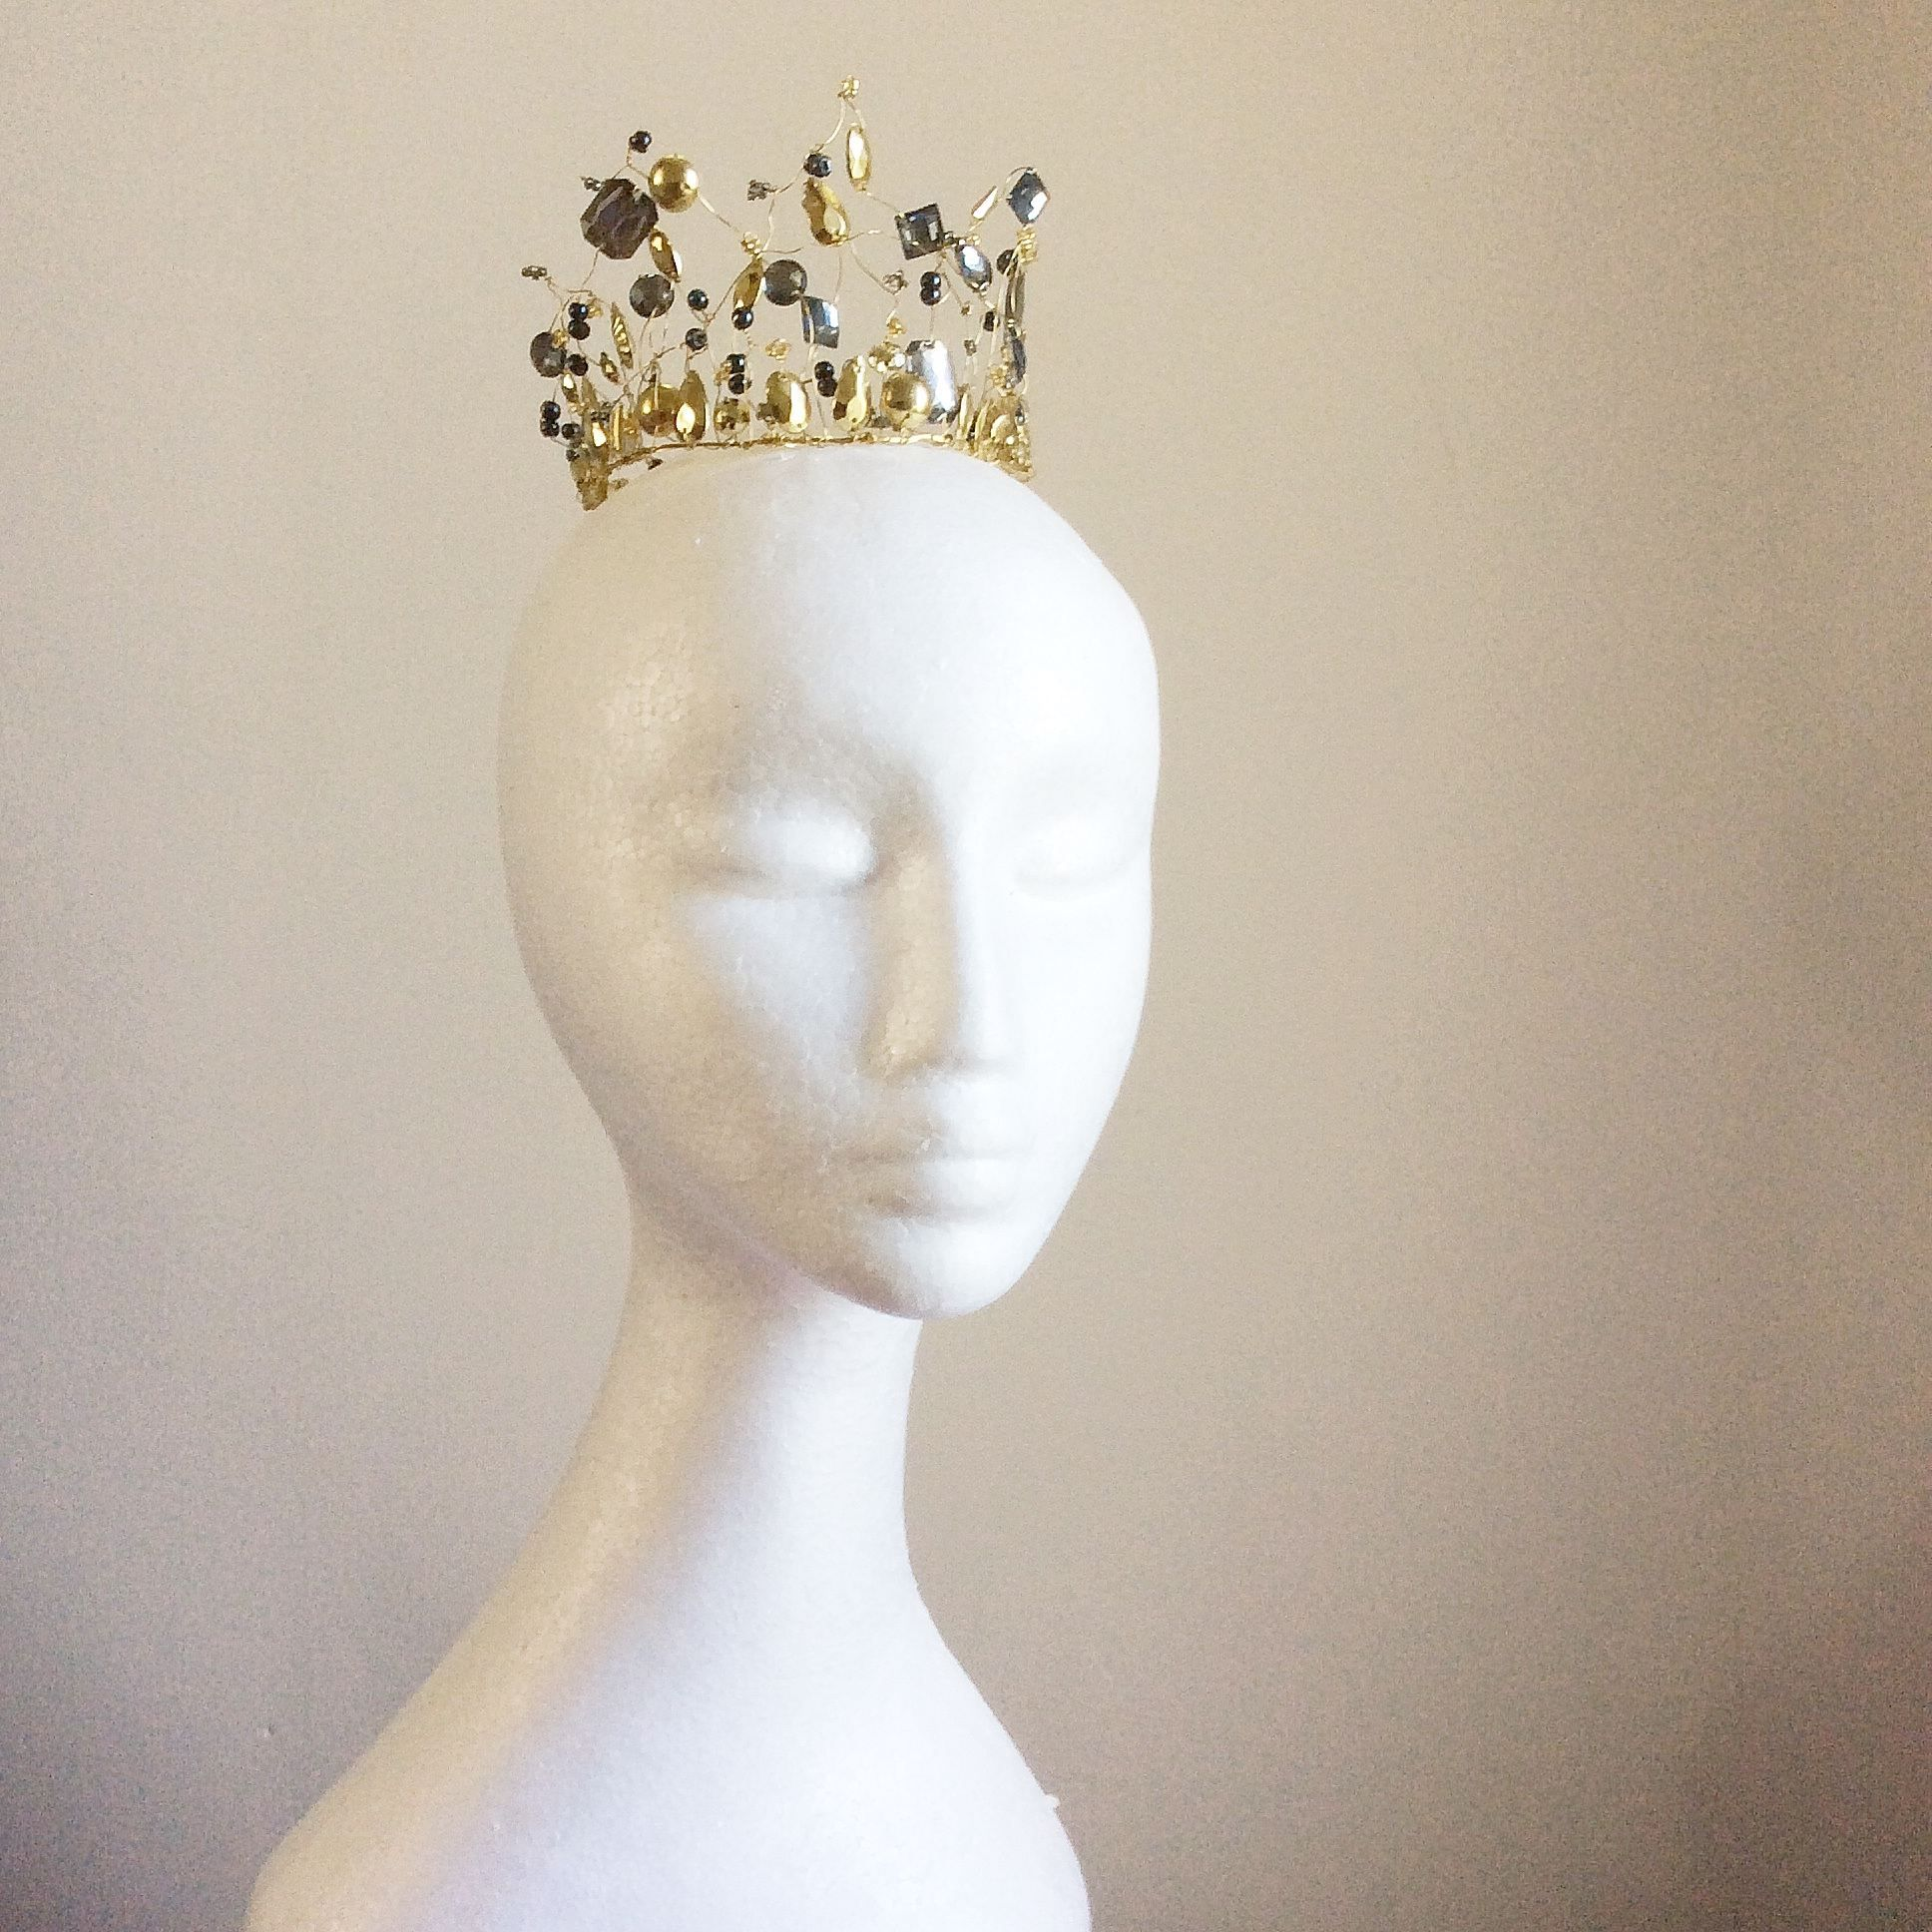 Princess crown, gold and grey coronet, fairy tale wedding, medieval wedding